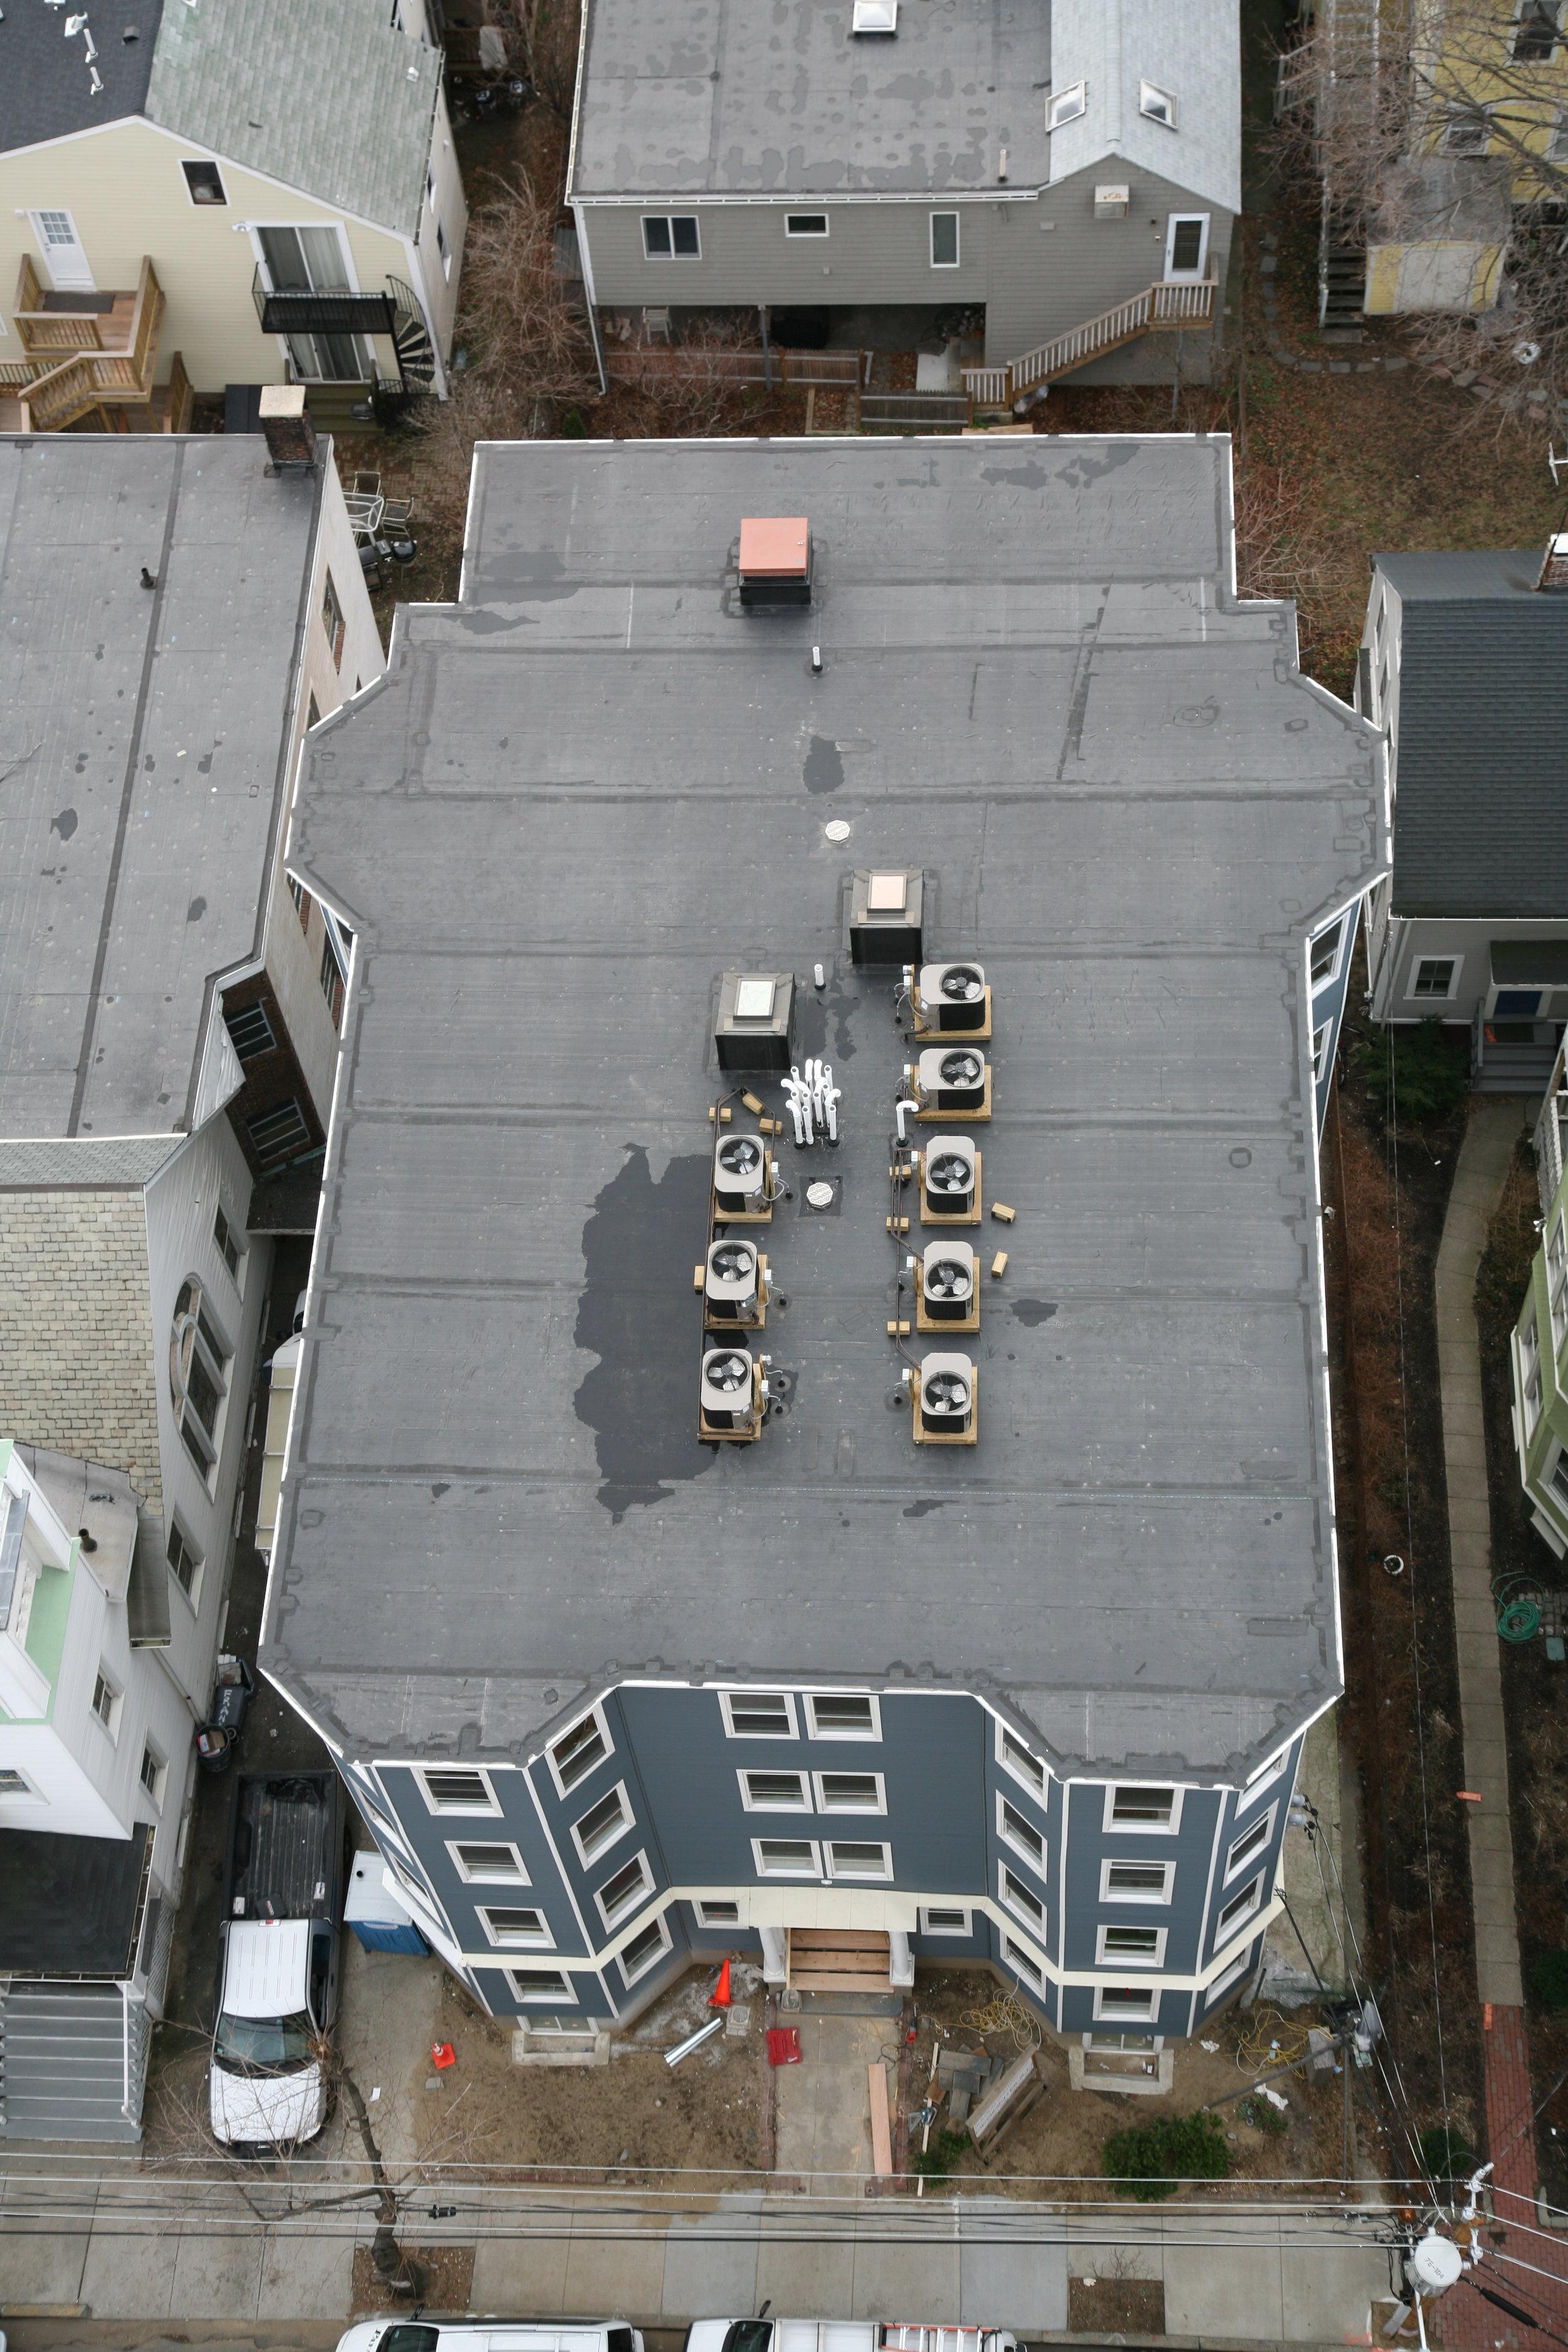 Cambridge Condo Fire Damage Reconstruction | Professional Loss Adjusters